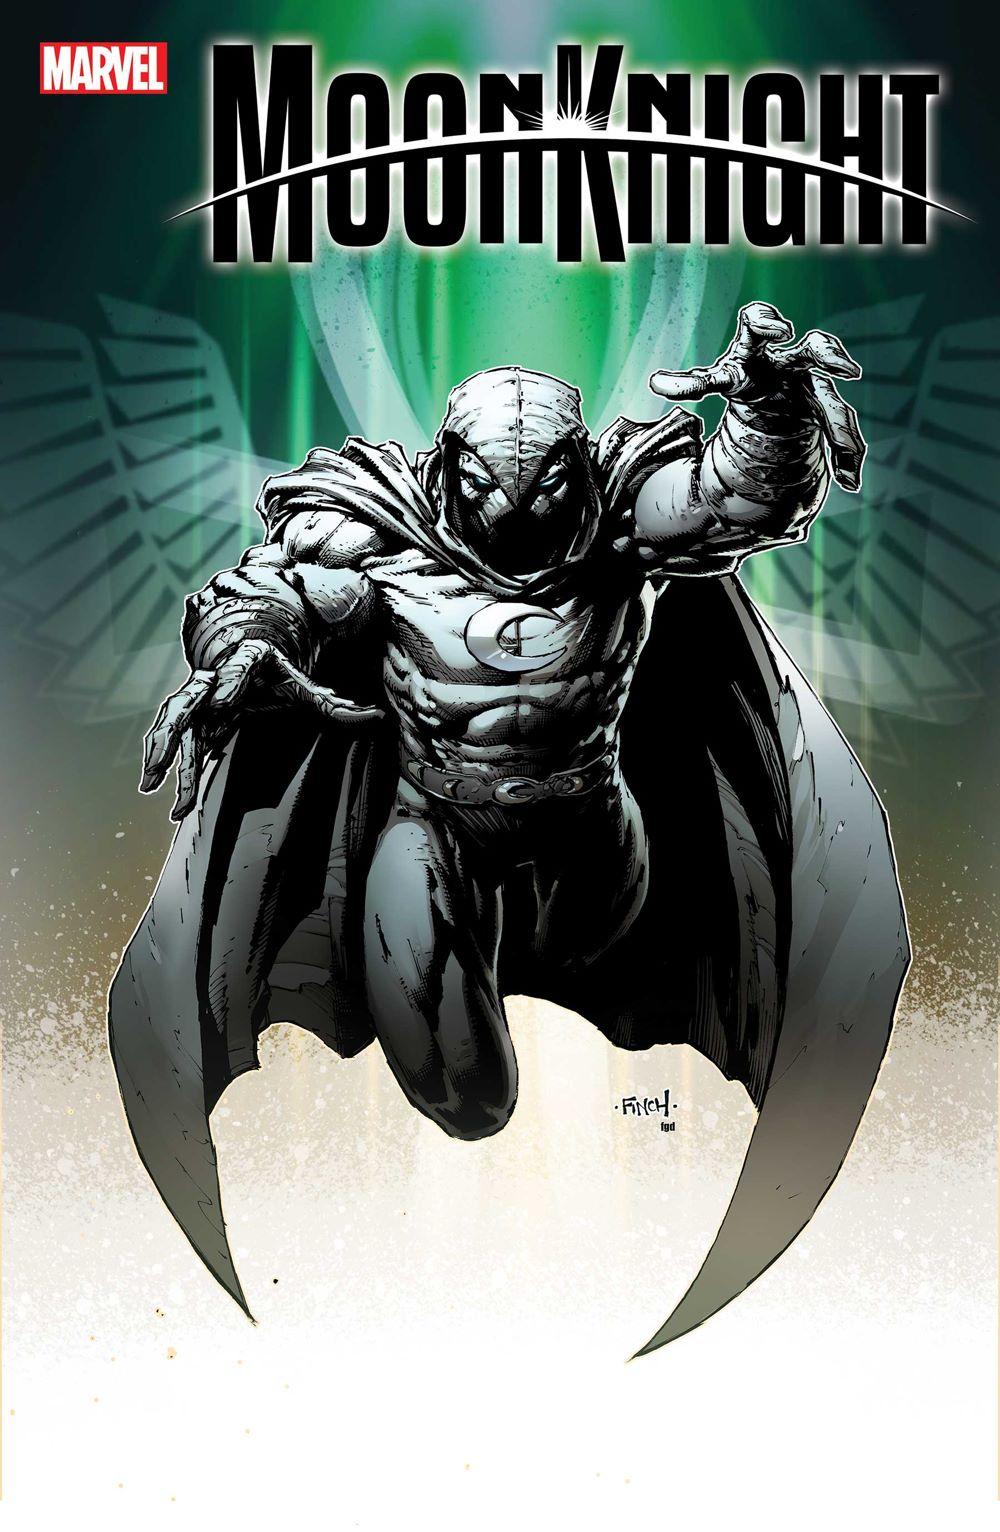 MOONKN2021002_Finch Marvel Comics August 2021 Solicitations